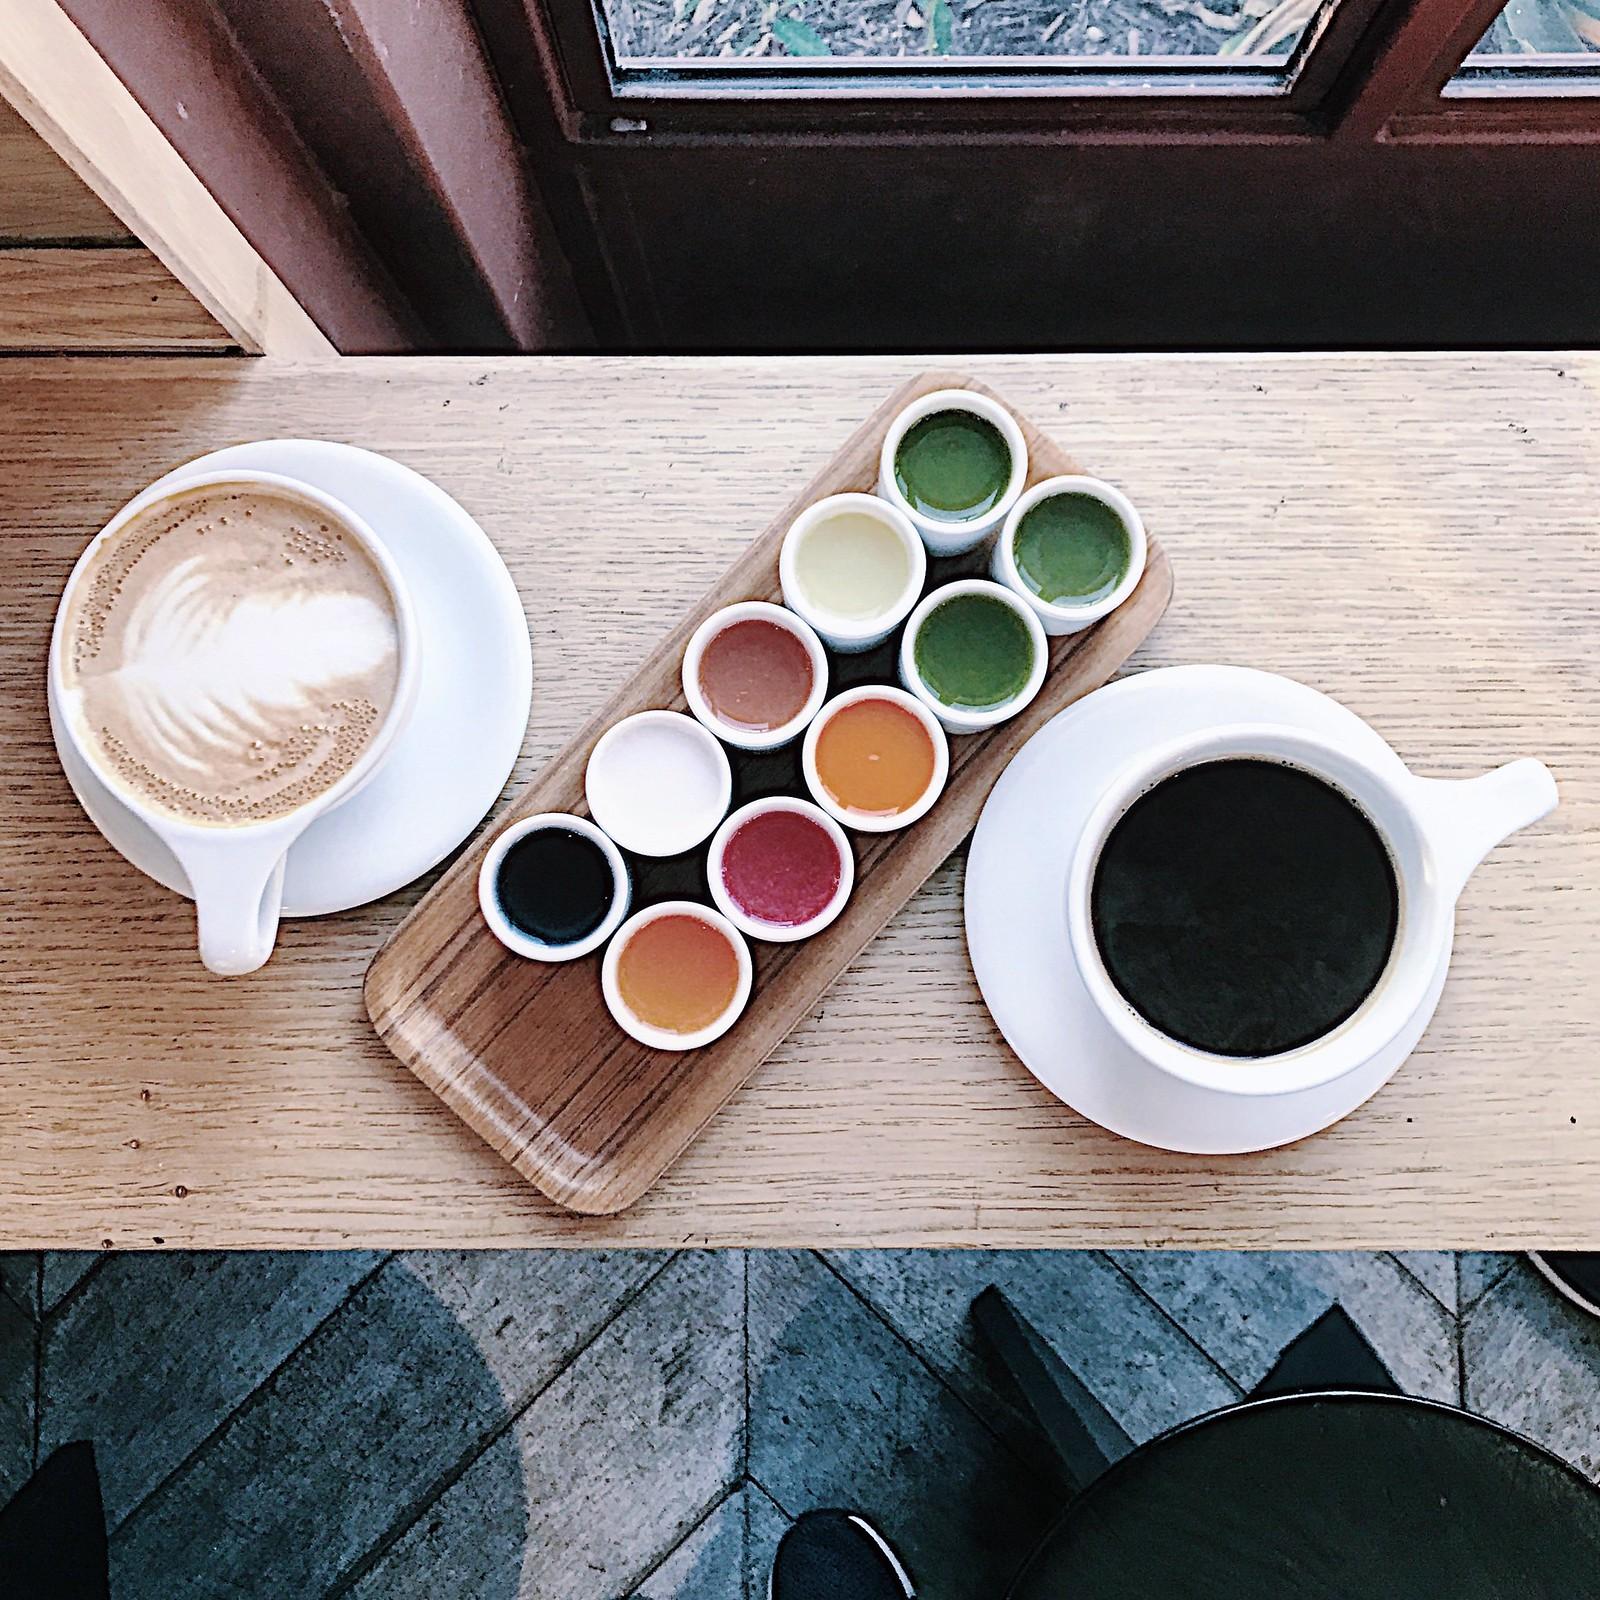 verve-coffee-roasters-coffeeshots-coffeeart-latte-latteart-dtla-dinela-foodie-hipster-latstory-clothestoyouuu-elizabeeetht